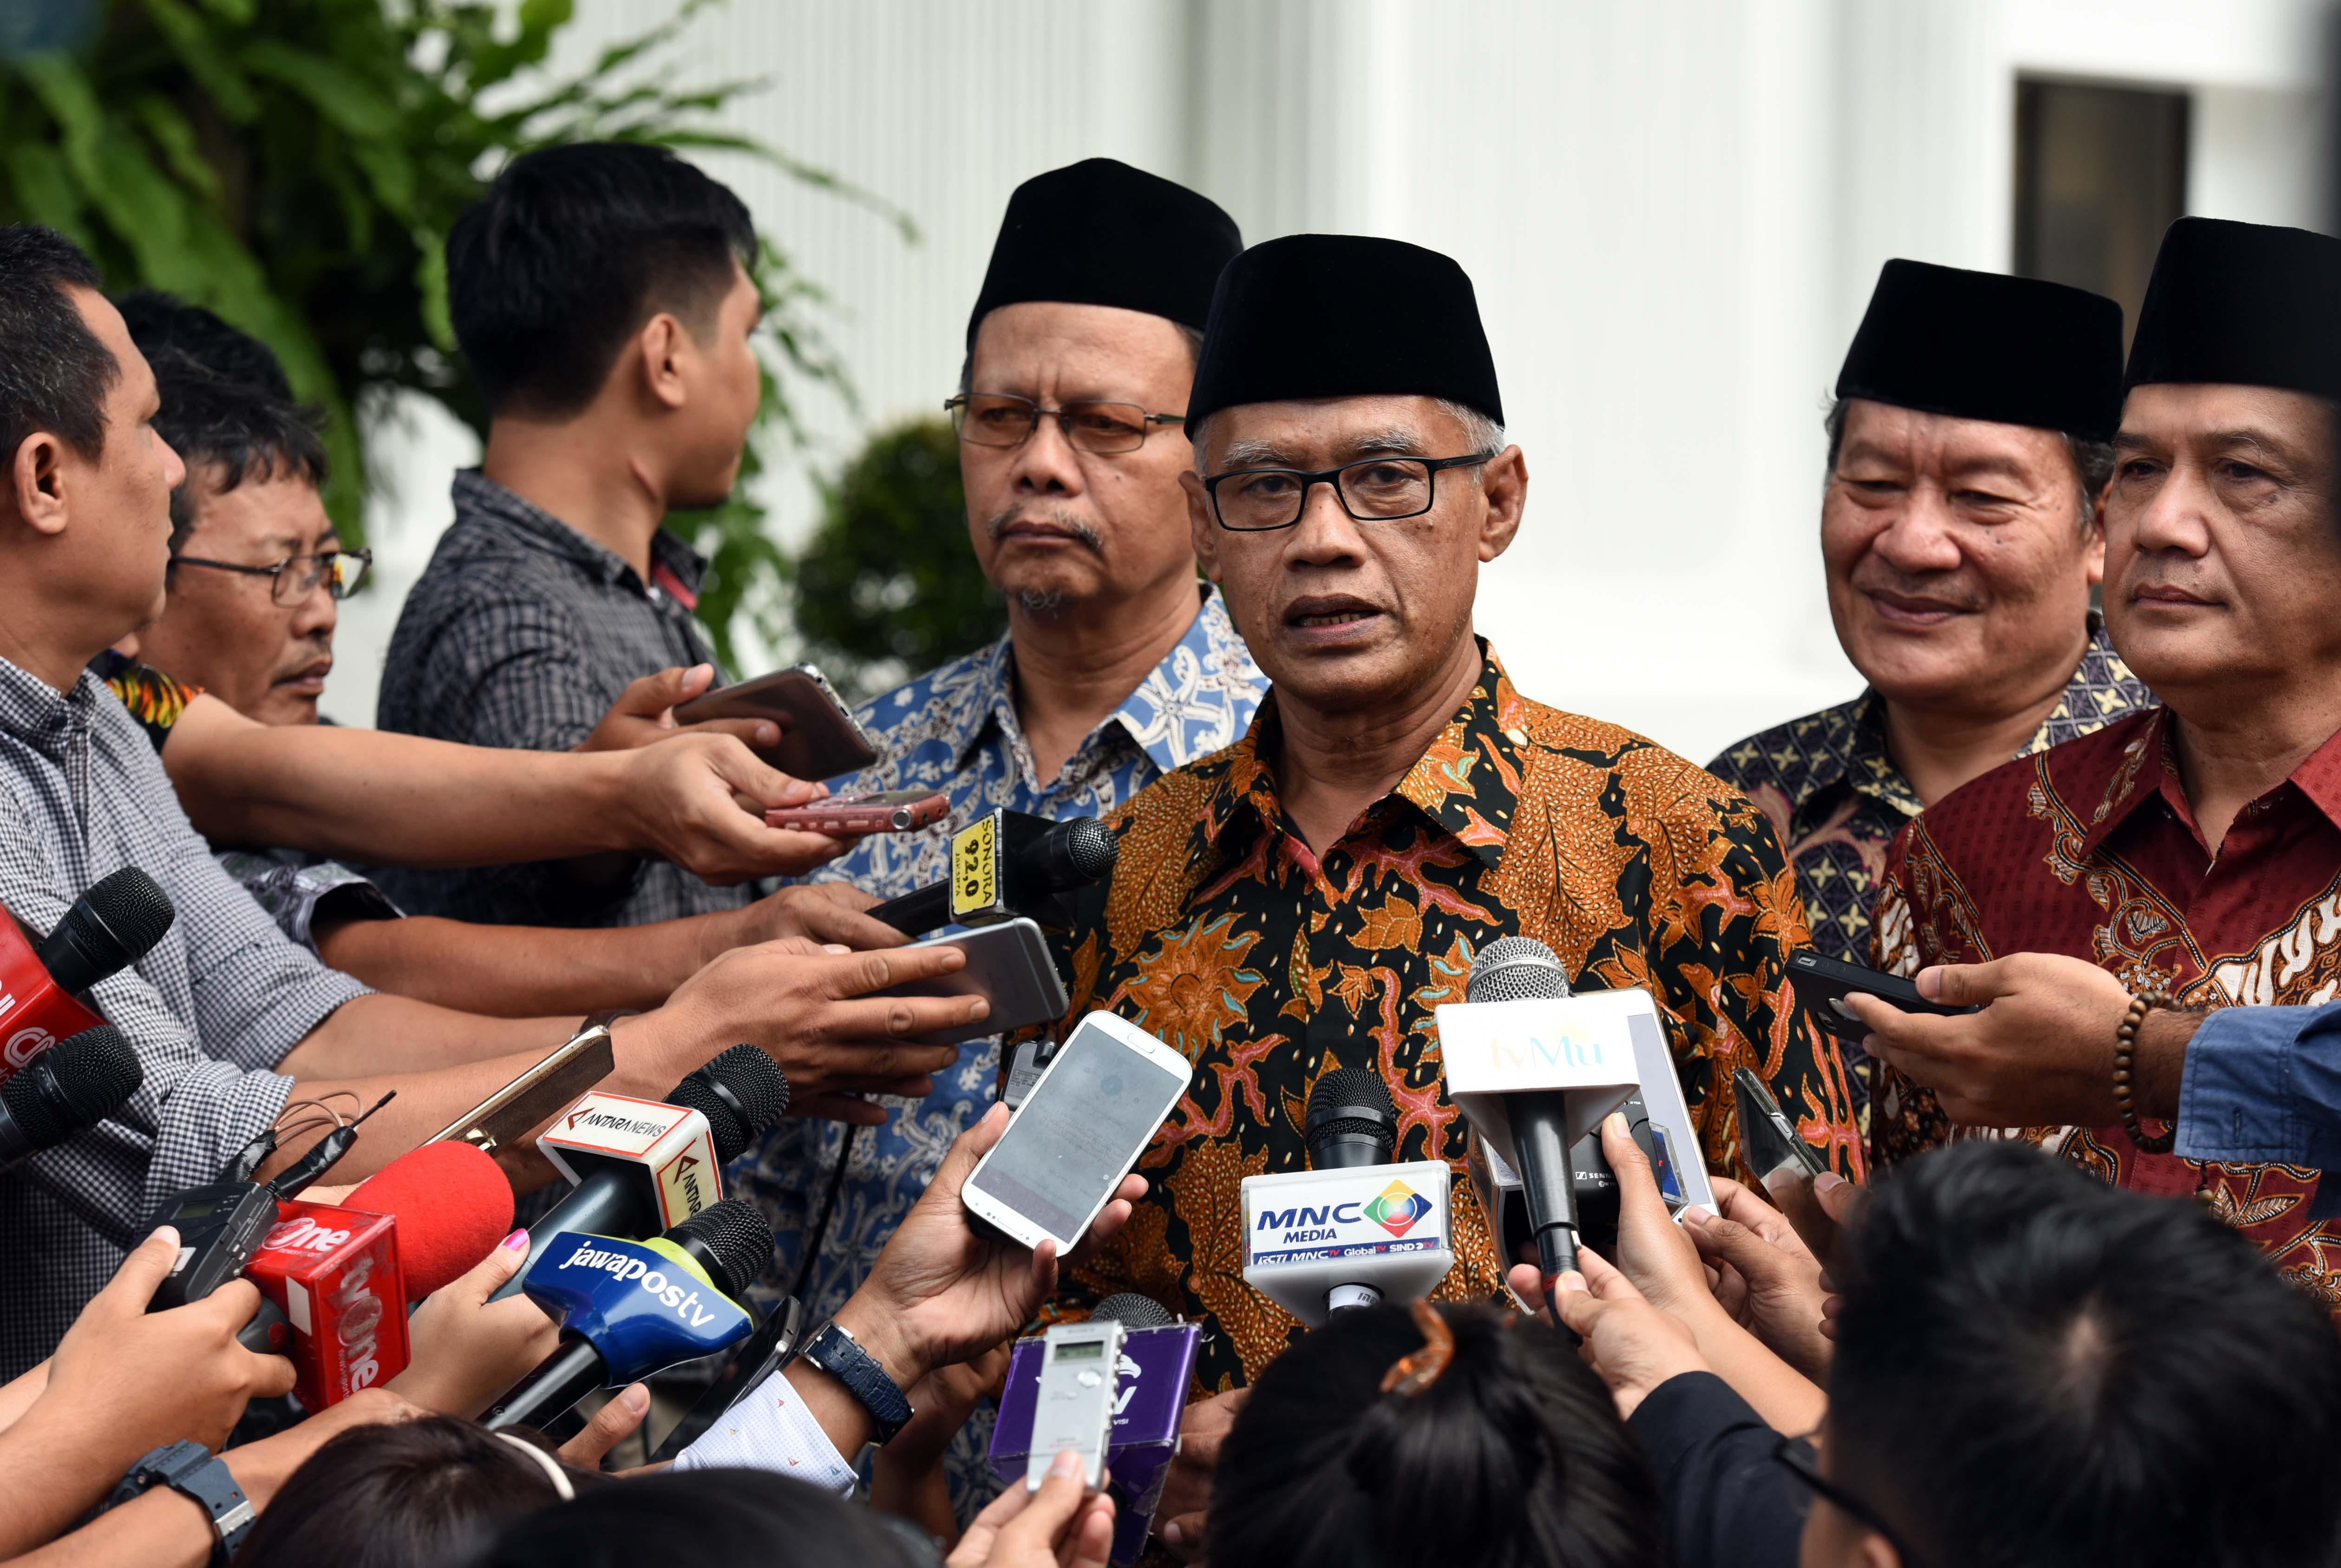 Chairman of Muhammadiyah Haedar Nasir after meeting with President Jokowi, Jakarta, Monday (13/2) afternoon. (Photo: PR/Jay)